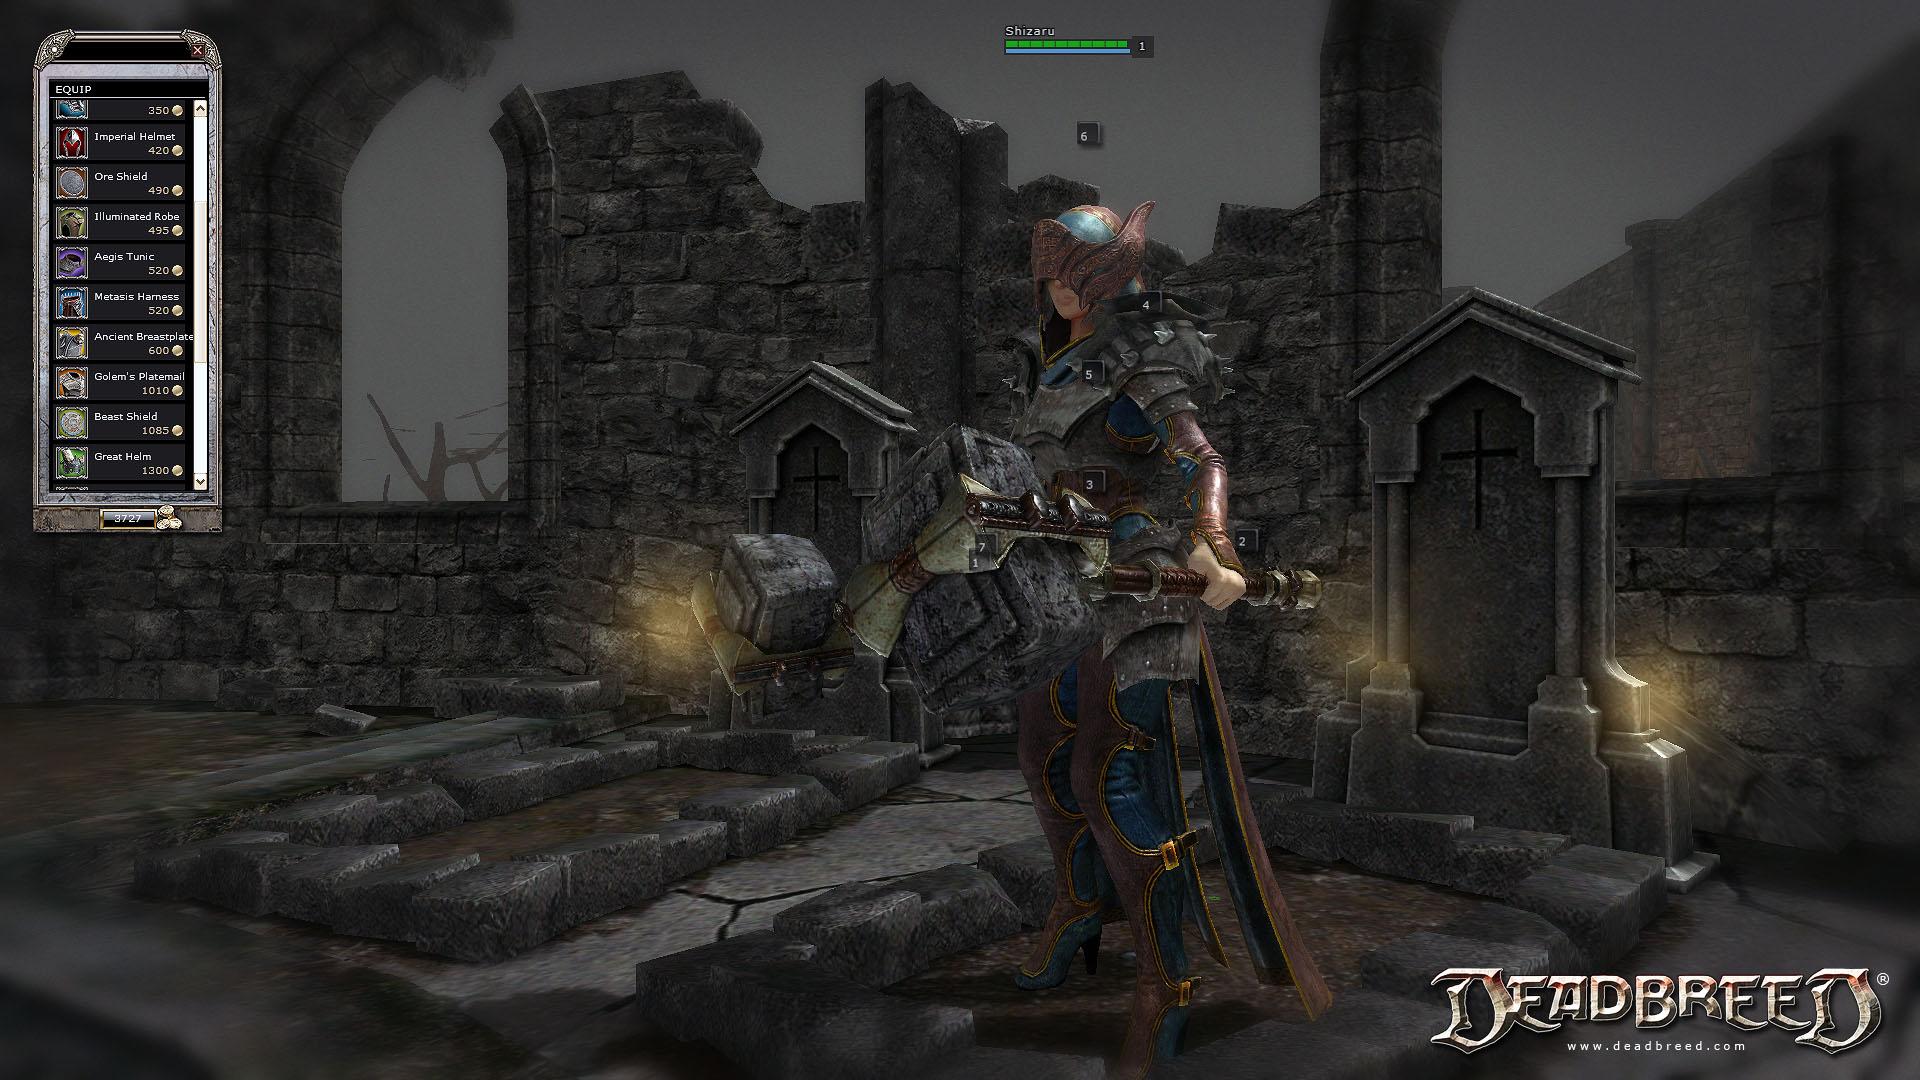 deadbreed_items_1[